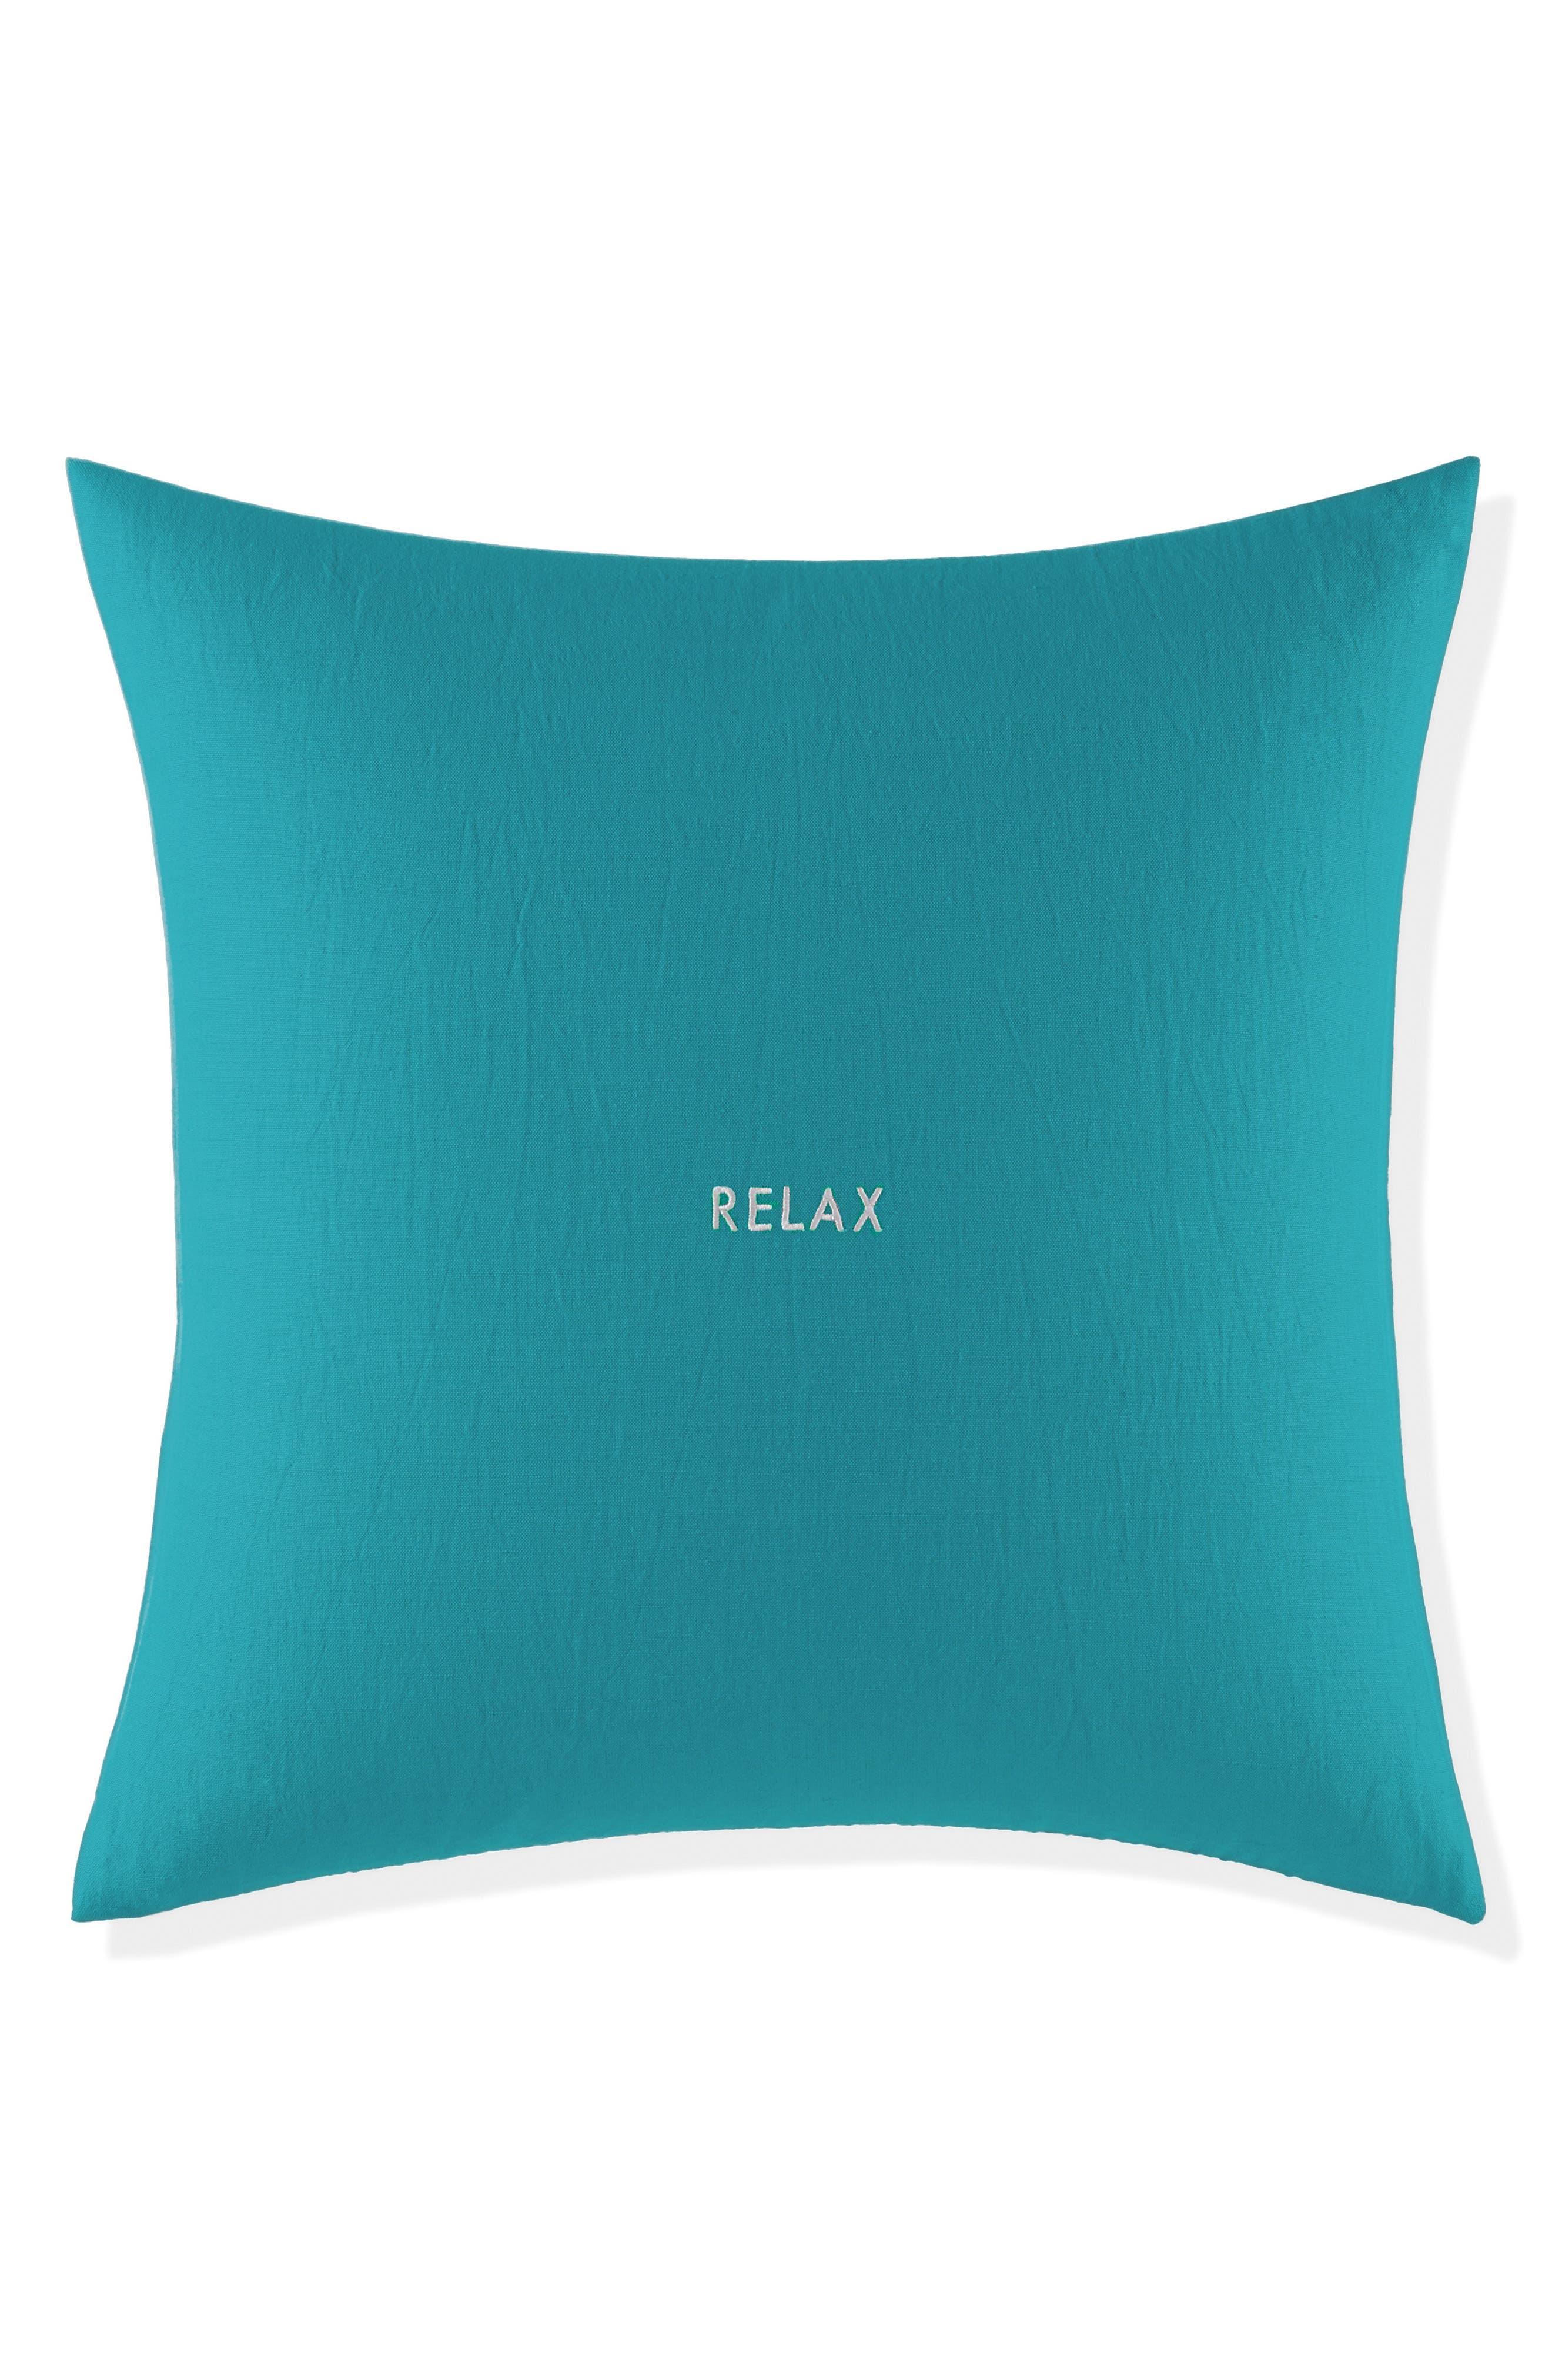 Main Image - kate spade new york relax pillow